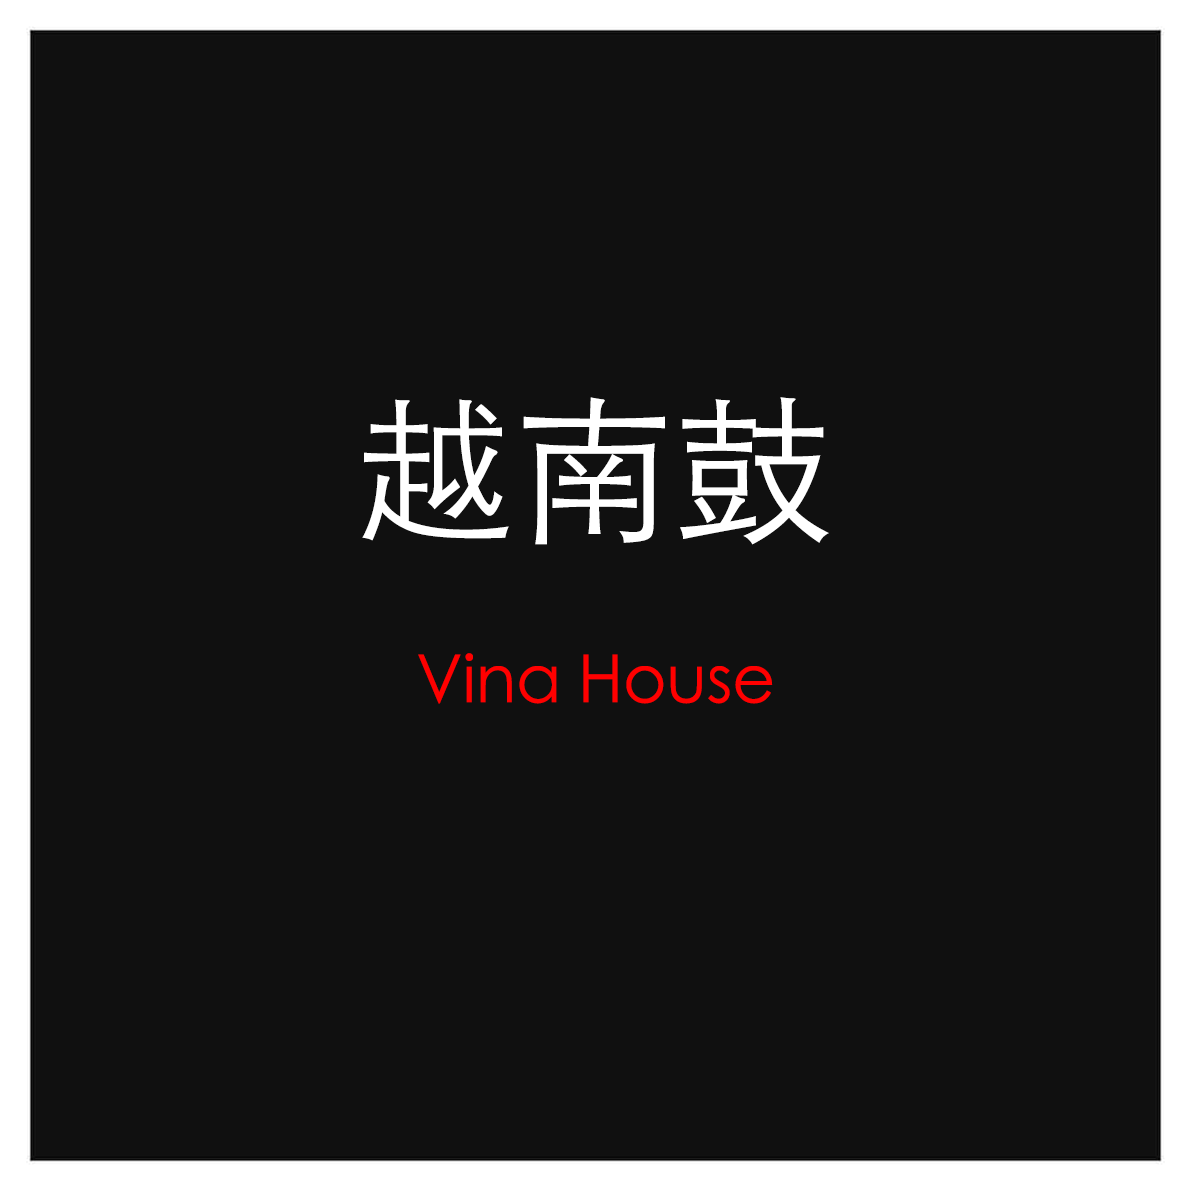 Vina House-中英文合集